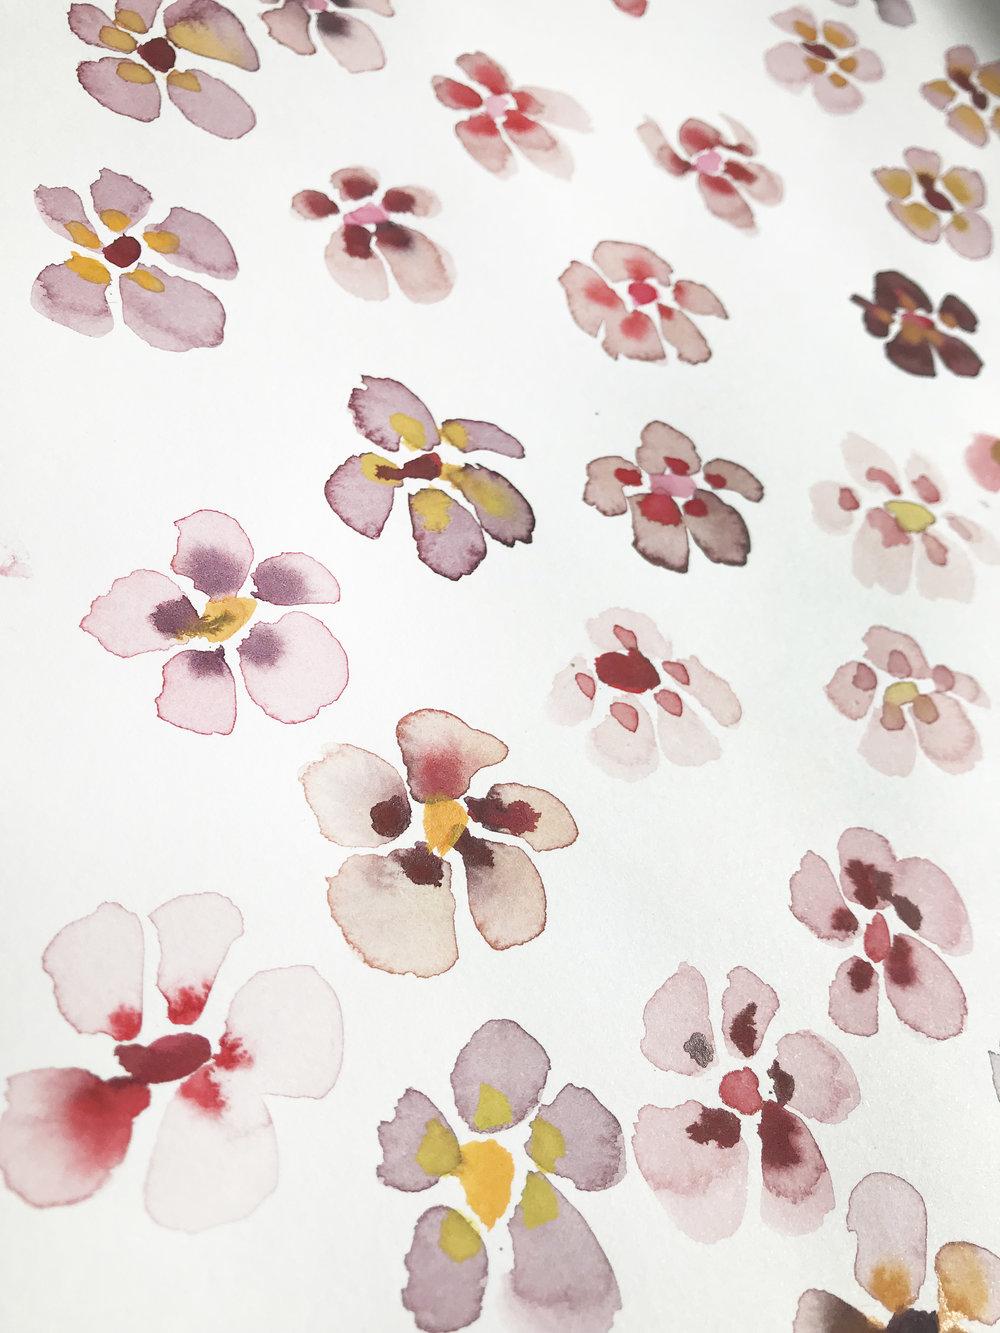 pia_angela_rasmussen_flower7.jpg